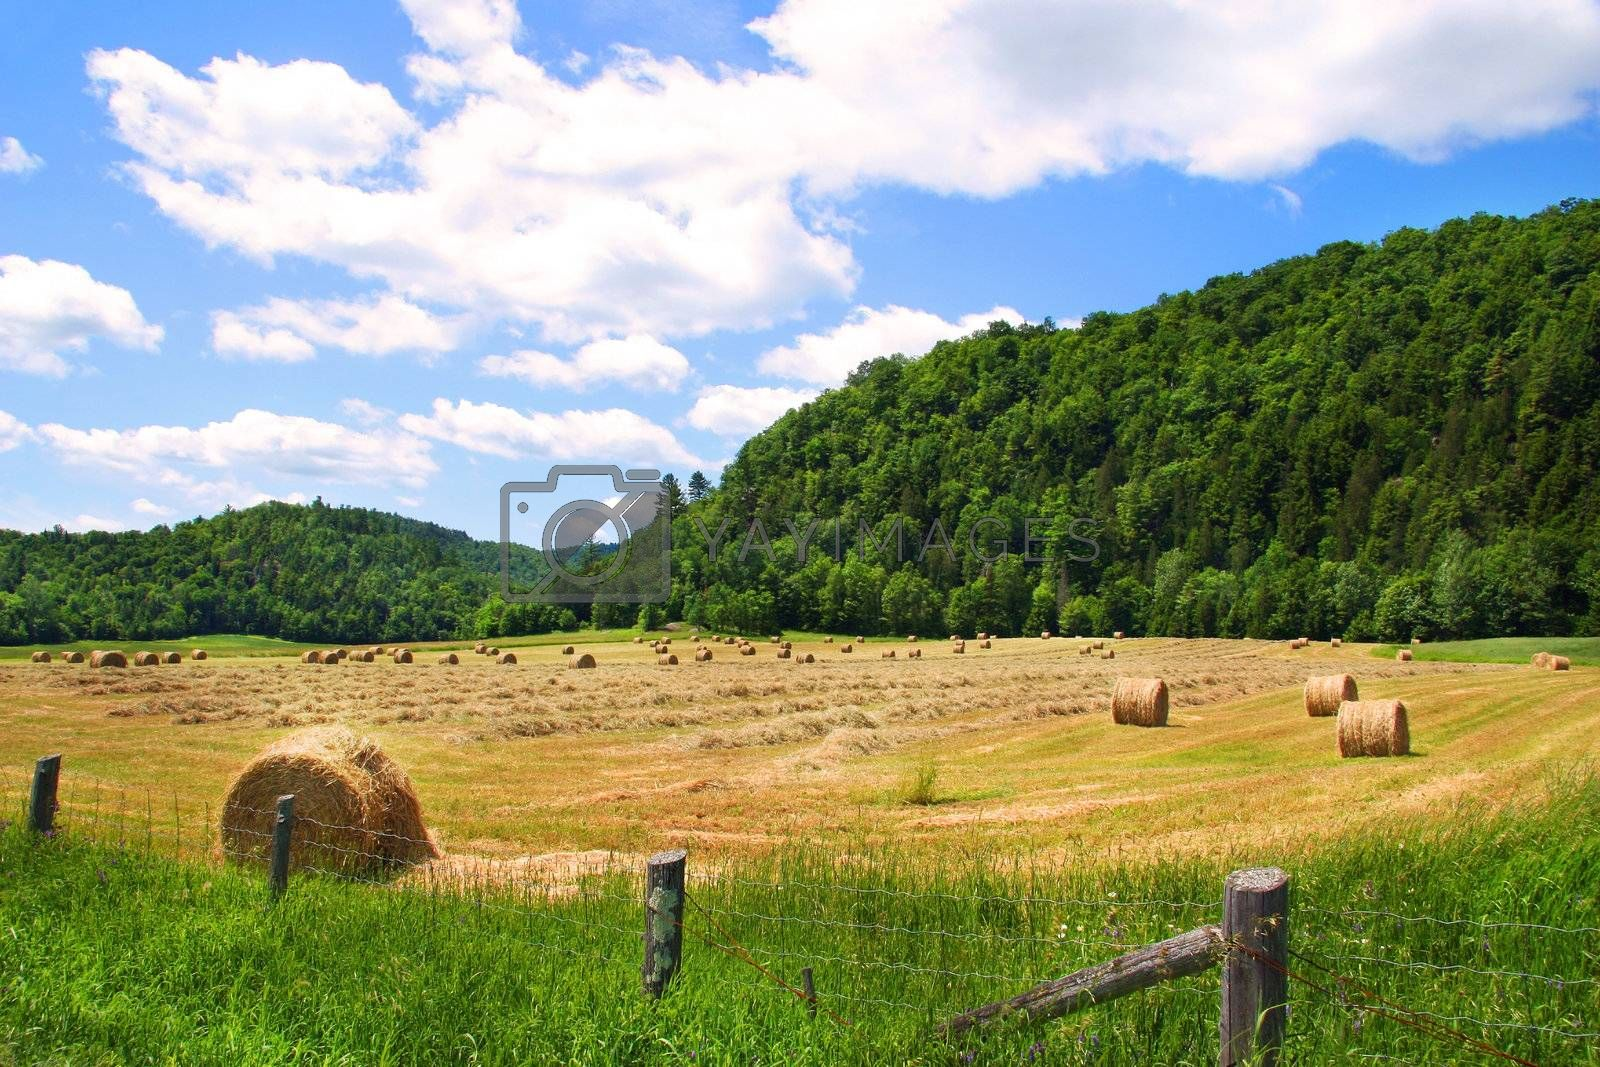 Harvestiing the hay in August